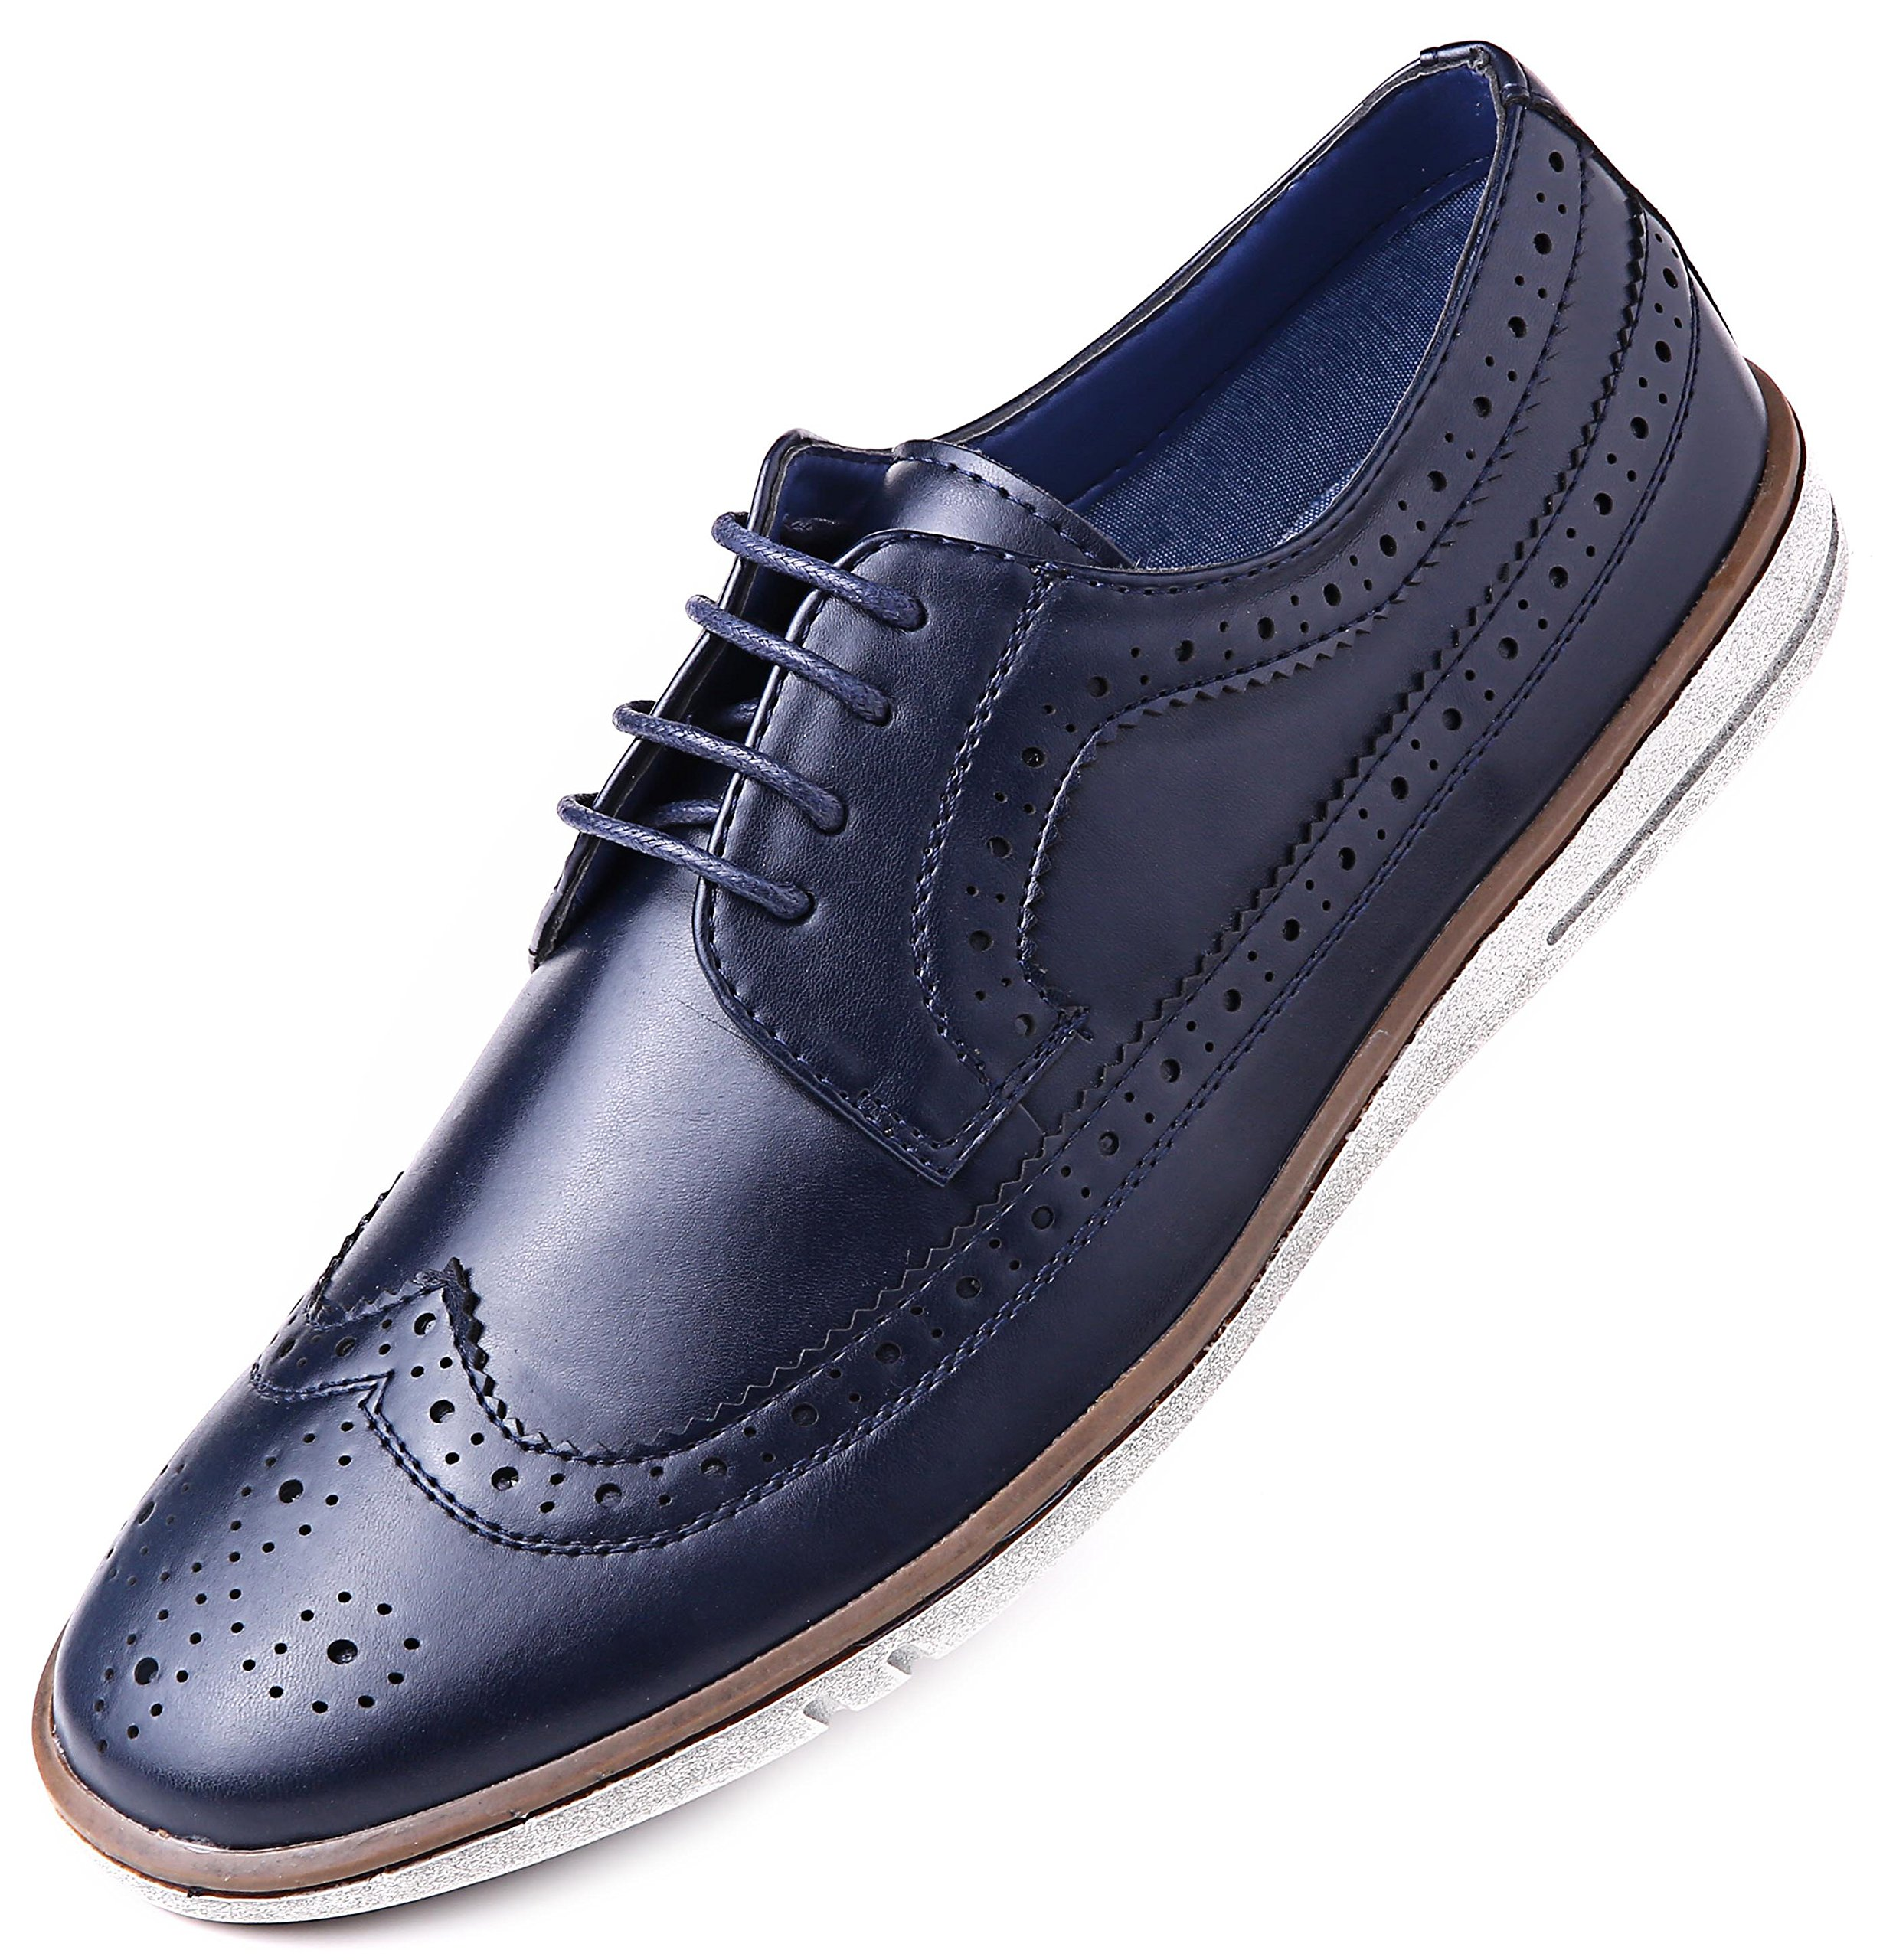 9c264cf657da Mio Marino Mens Dress Shoes - Fashion Casual Oxford Shoes for Men - Round  Toe Dress Claviko - Navy - 9 D(M) US